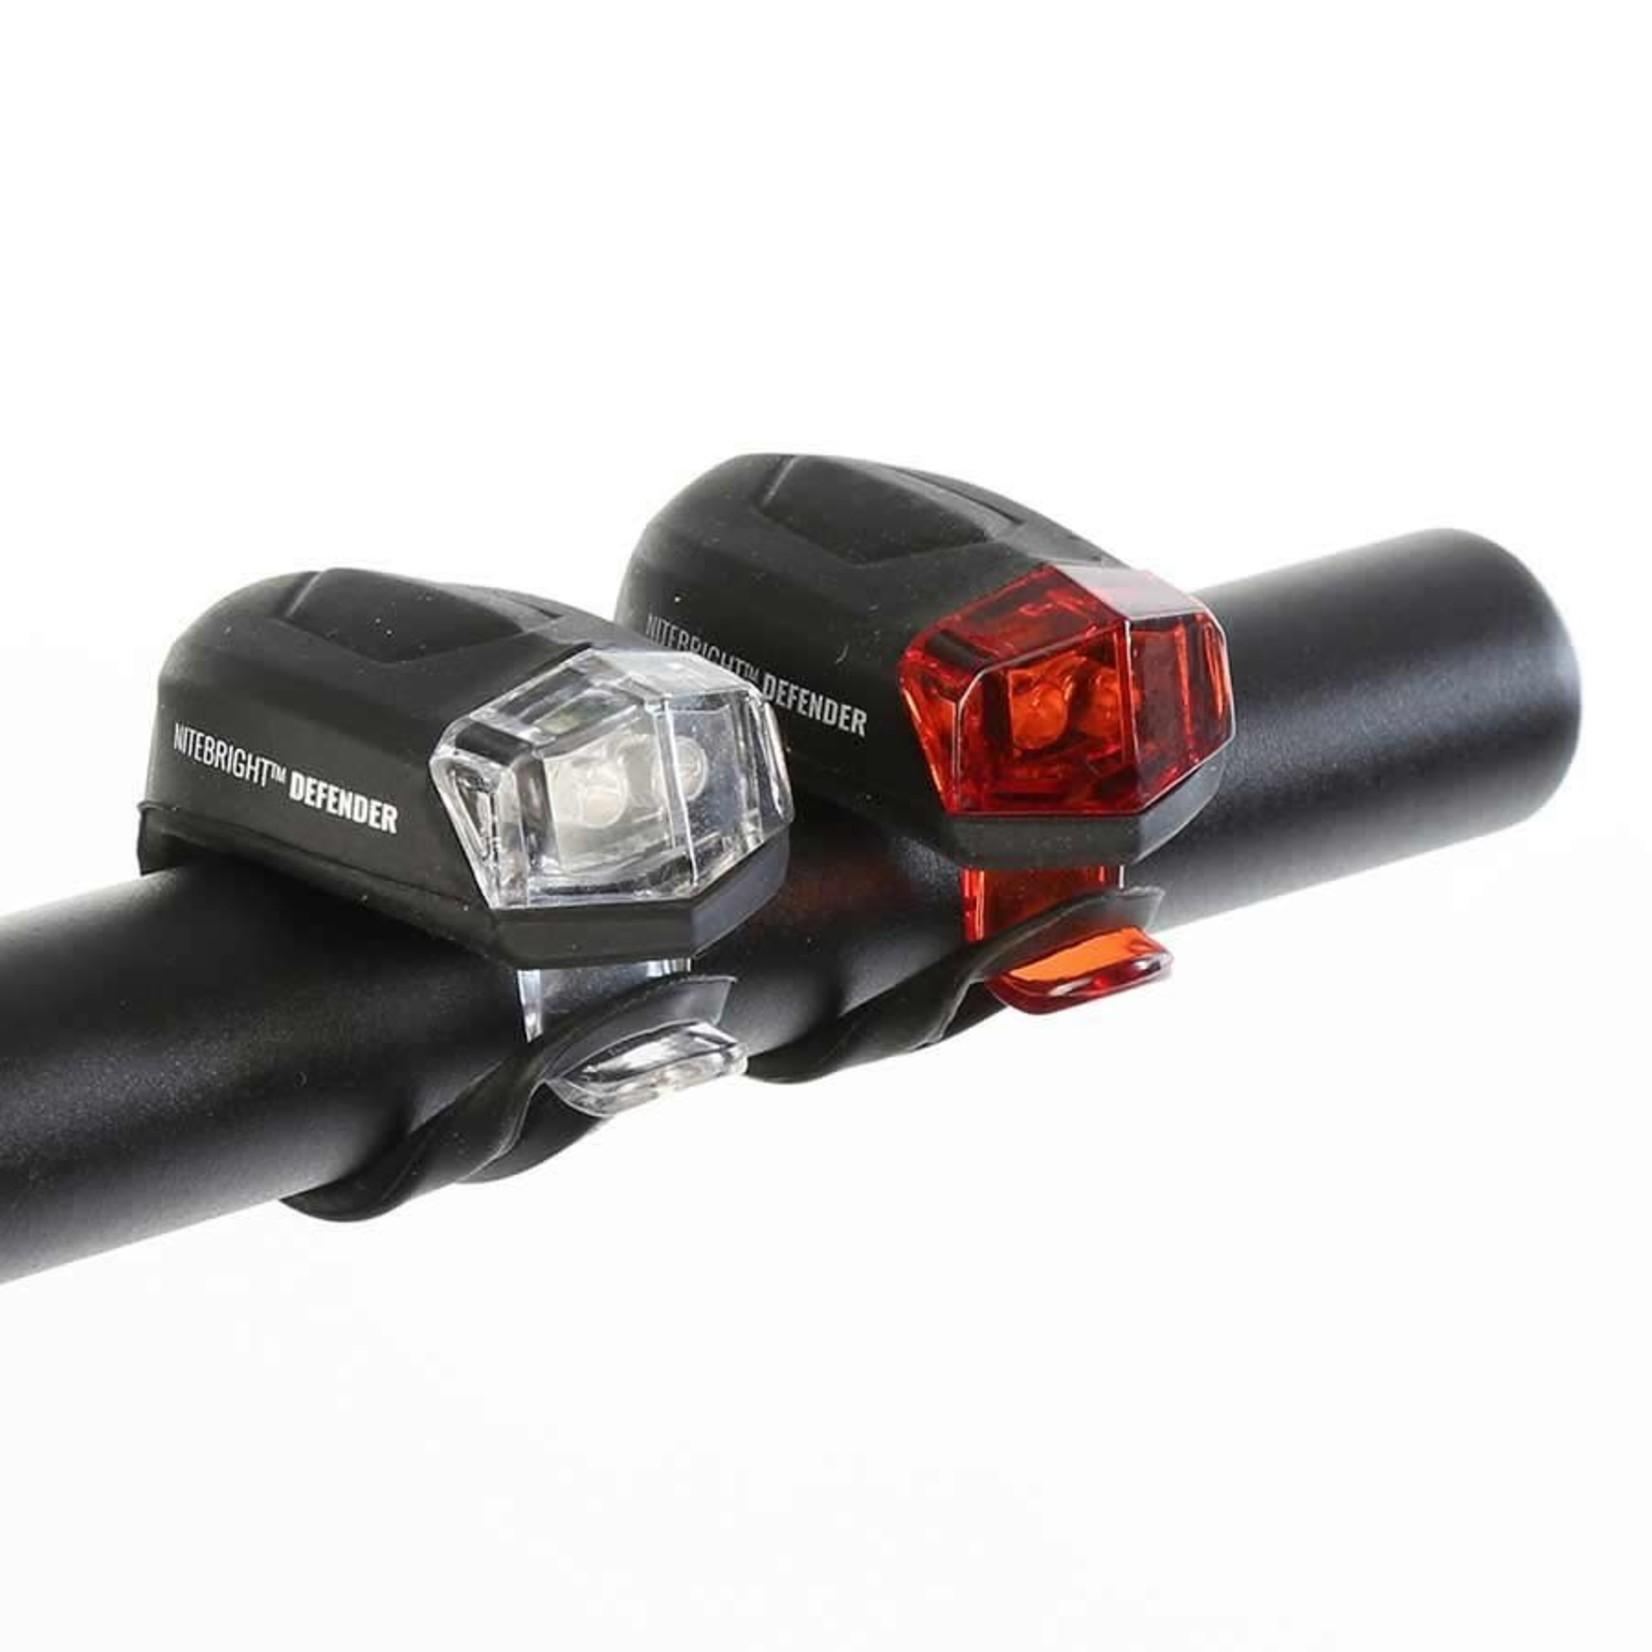 Evo Evo Bike Light Set, NiteLight Defender, Blk